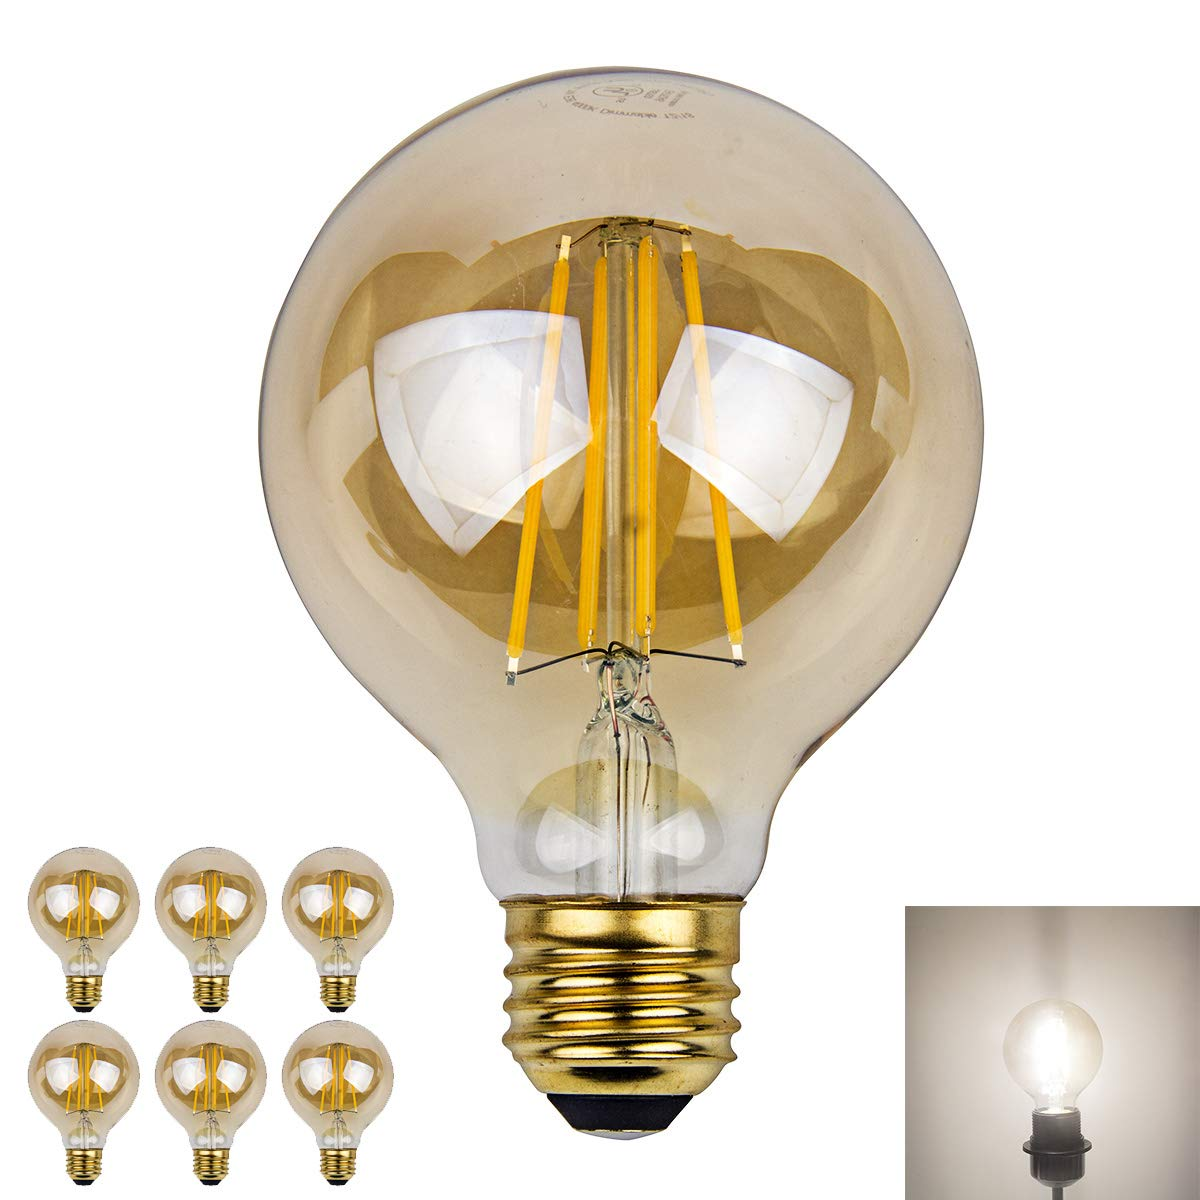 Dimmable Edison Led Globe Light Bulb G25 Daylight Nature